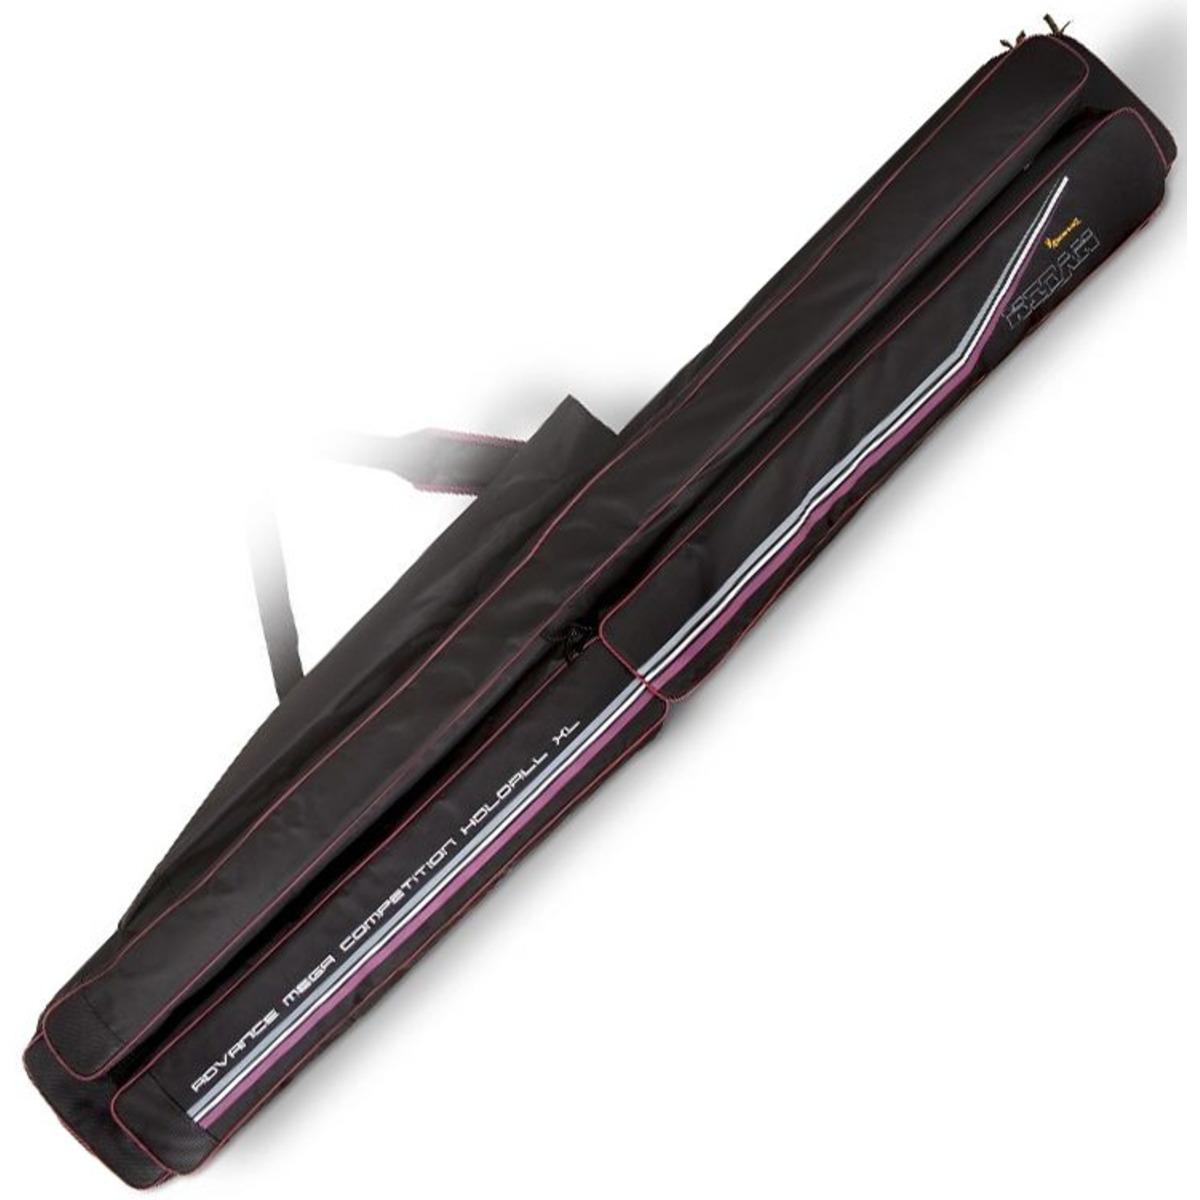 Browning Rutentasche Multi Taschen Advance Large - 1.90 m - Röhre 6